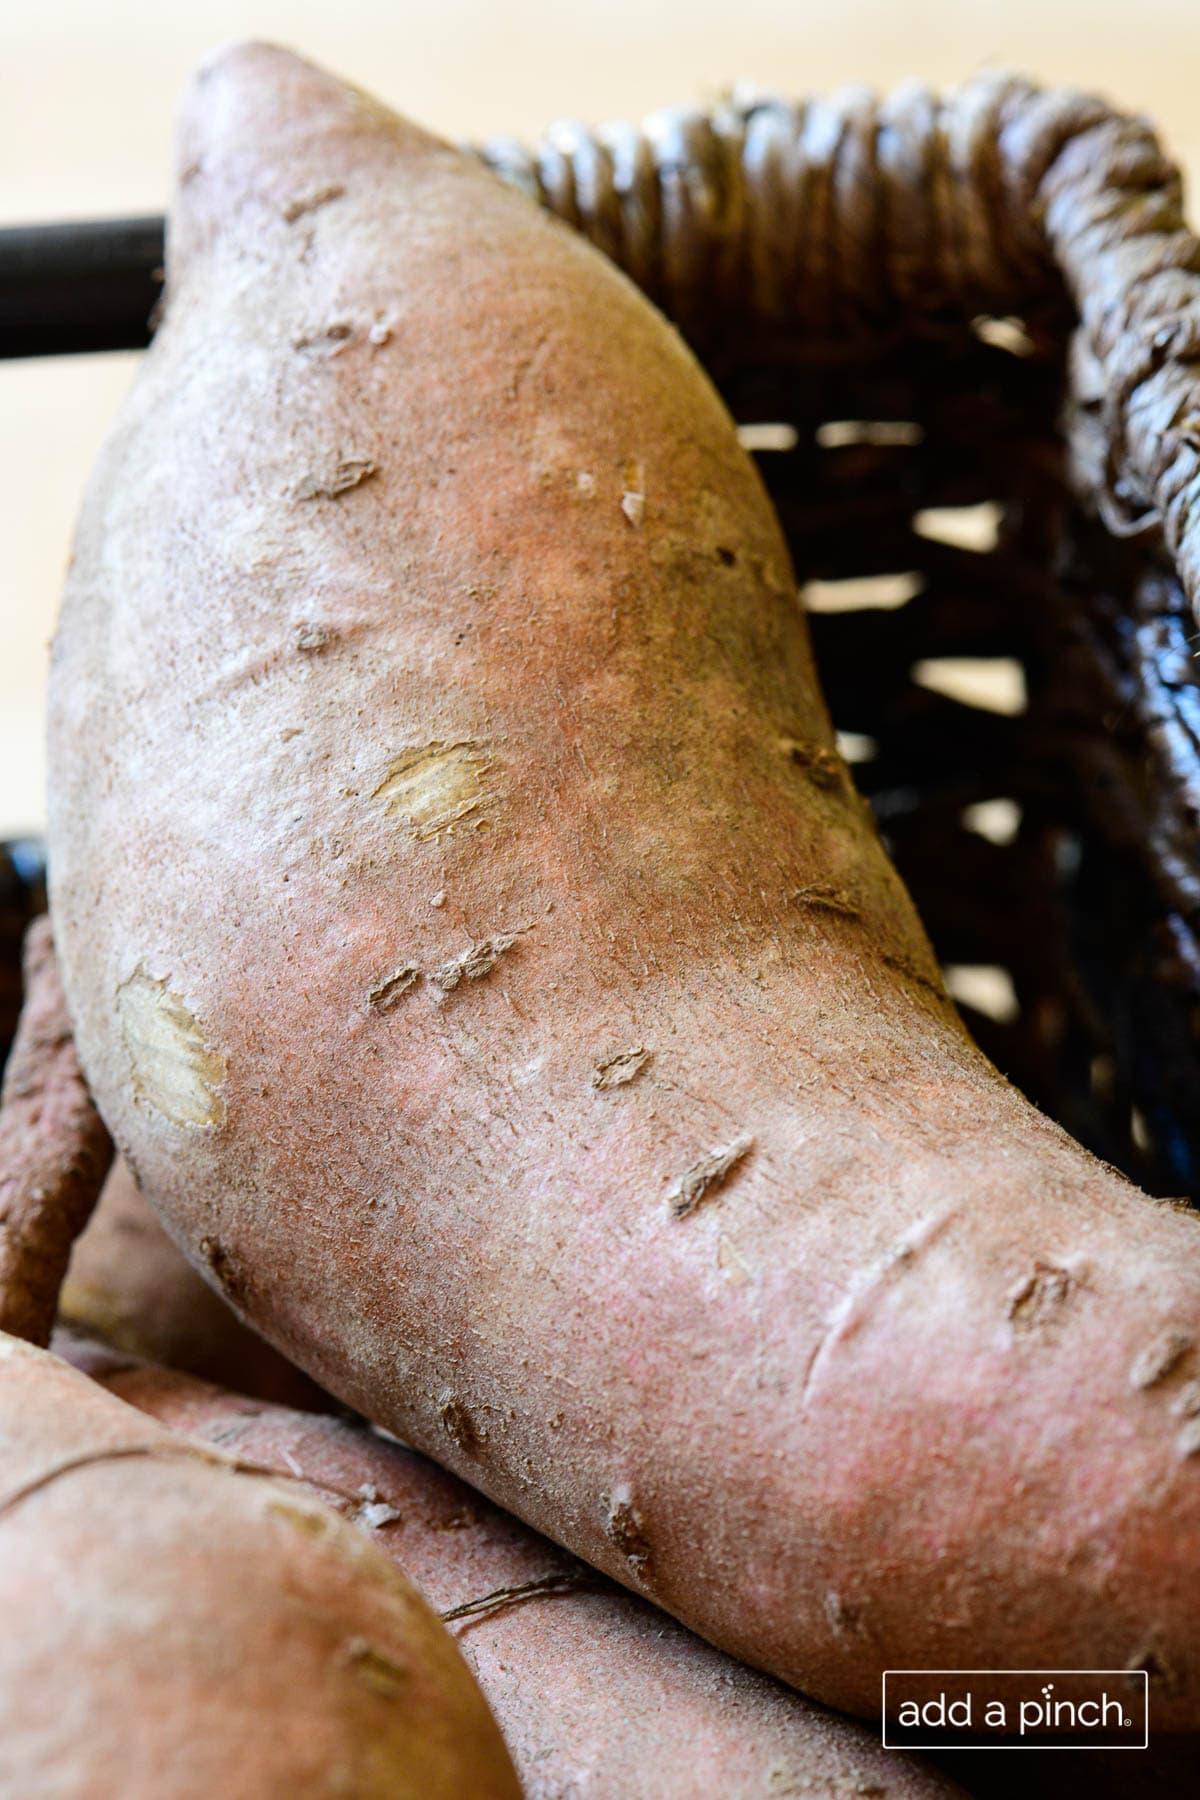 Closeup photo of a sweet potato in a wicker basket.